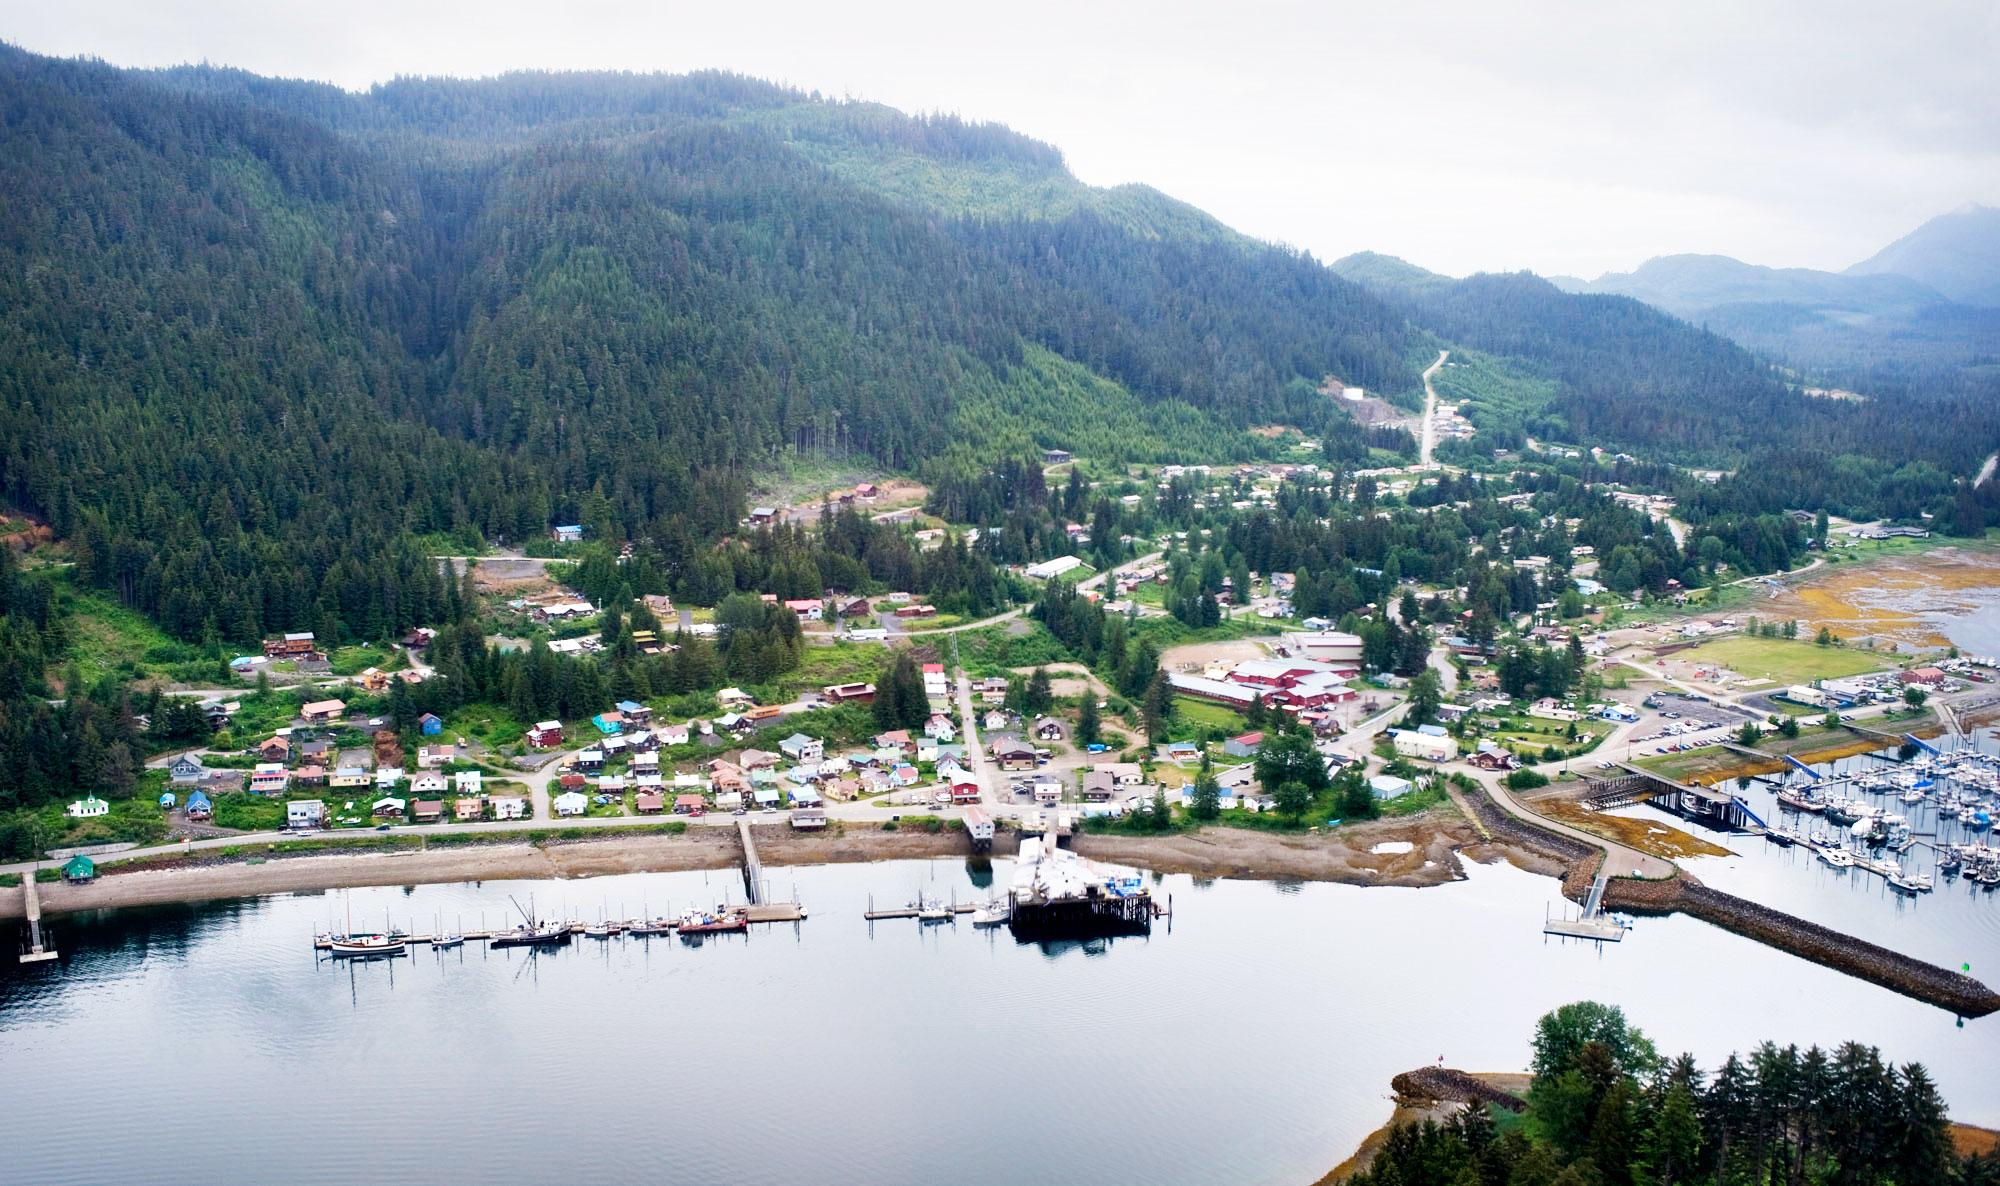 Aerial photo of Juneau, Alaska